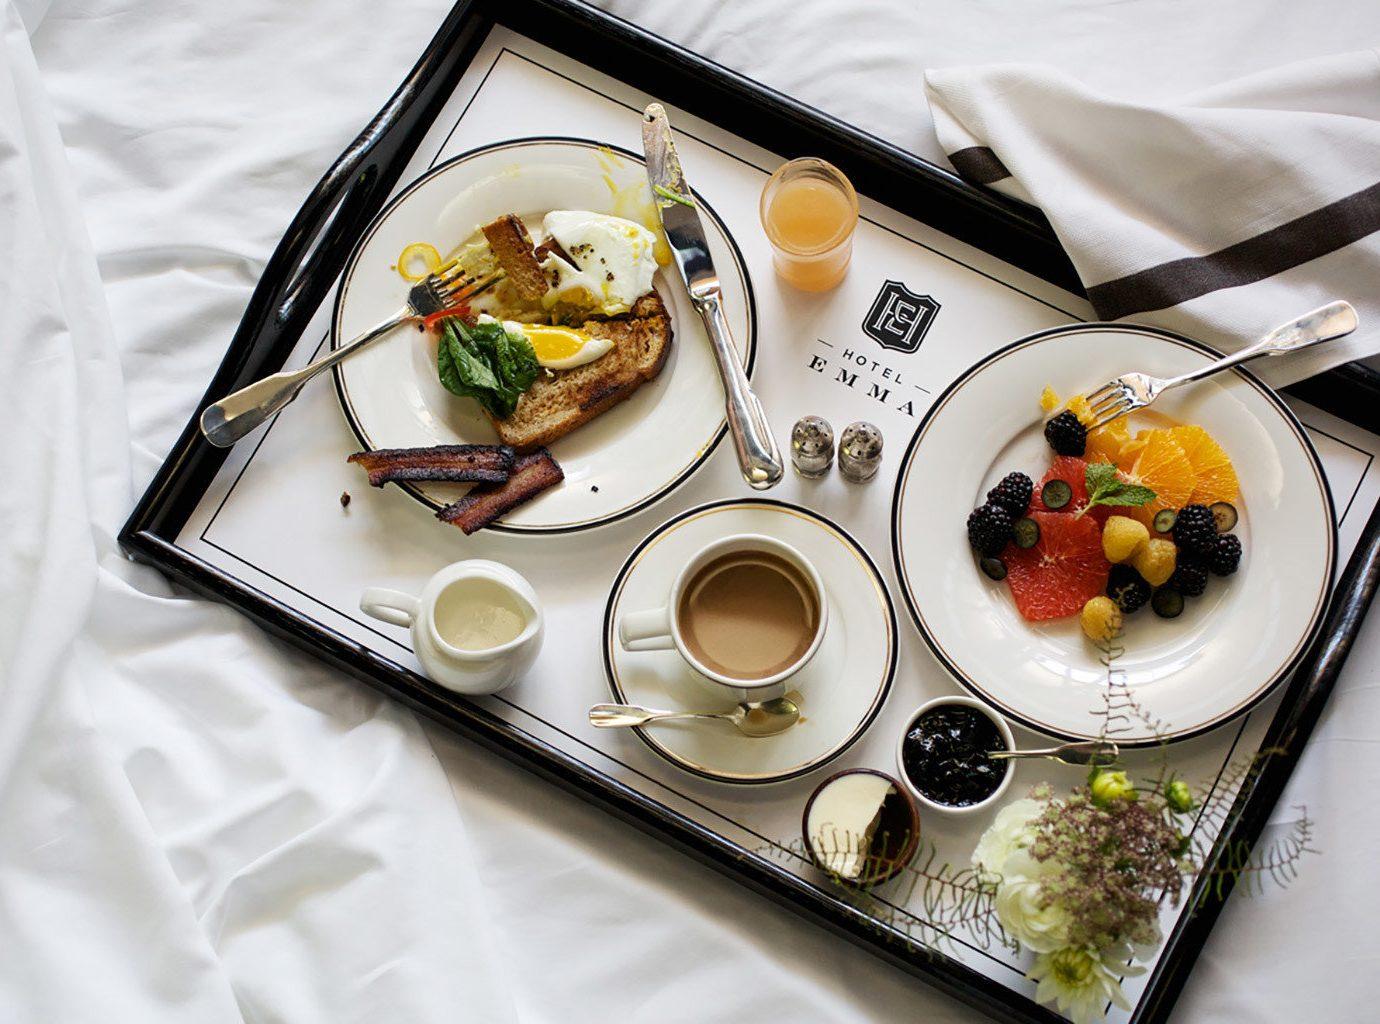 Budget Weekend Getaways table food plate dish meal breakfast lunch brunch produce sense cuisine